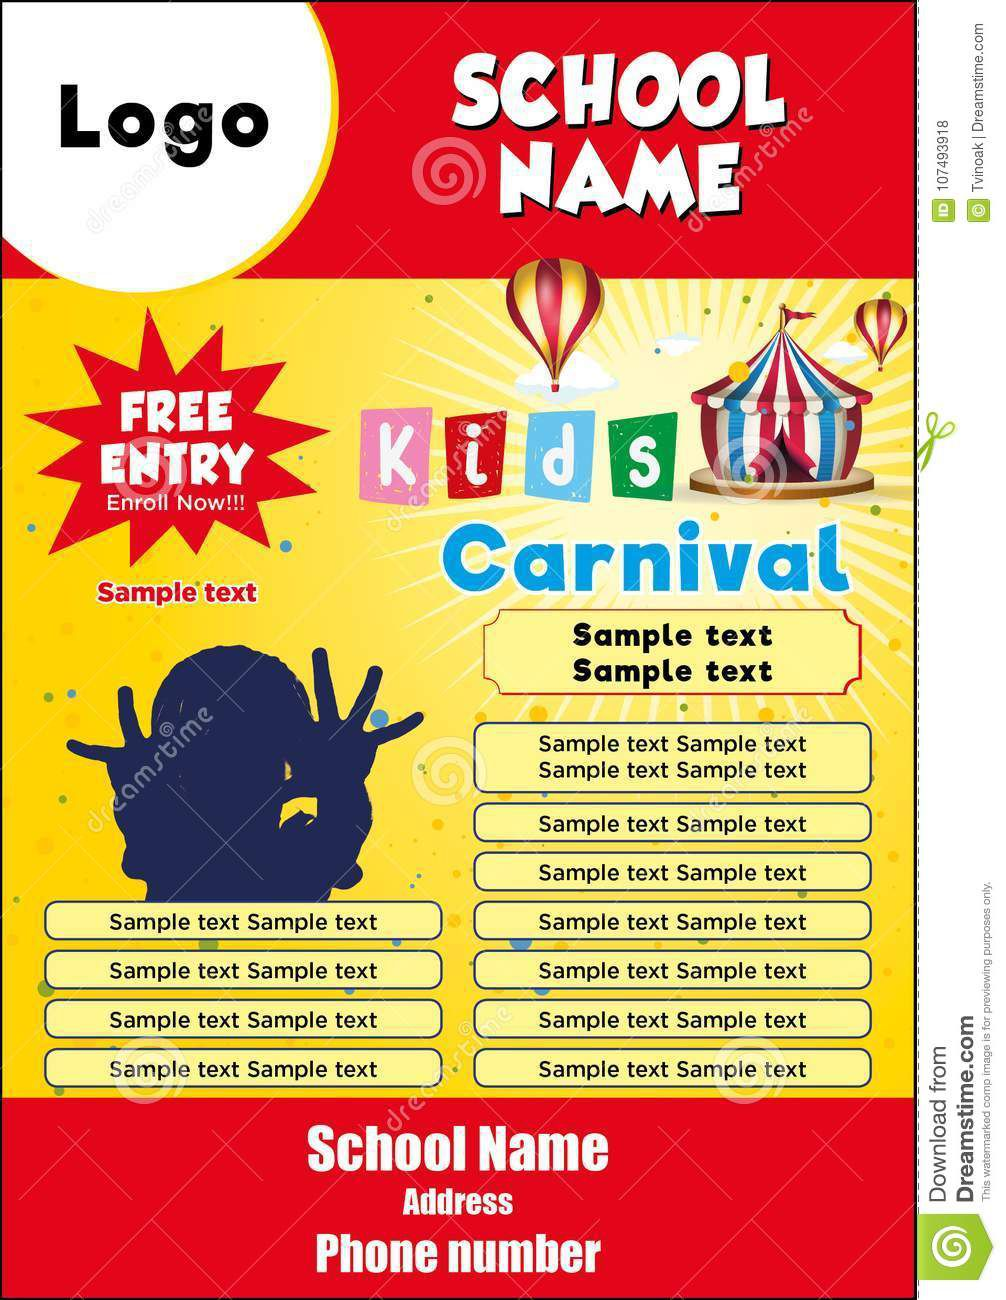 008 Stirring Free School Carnival Flyer Template Sample  Templates DownloadFull